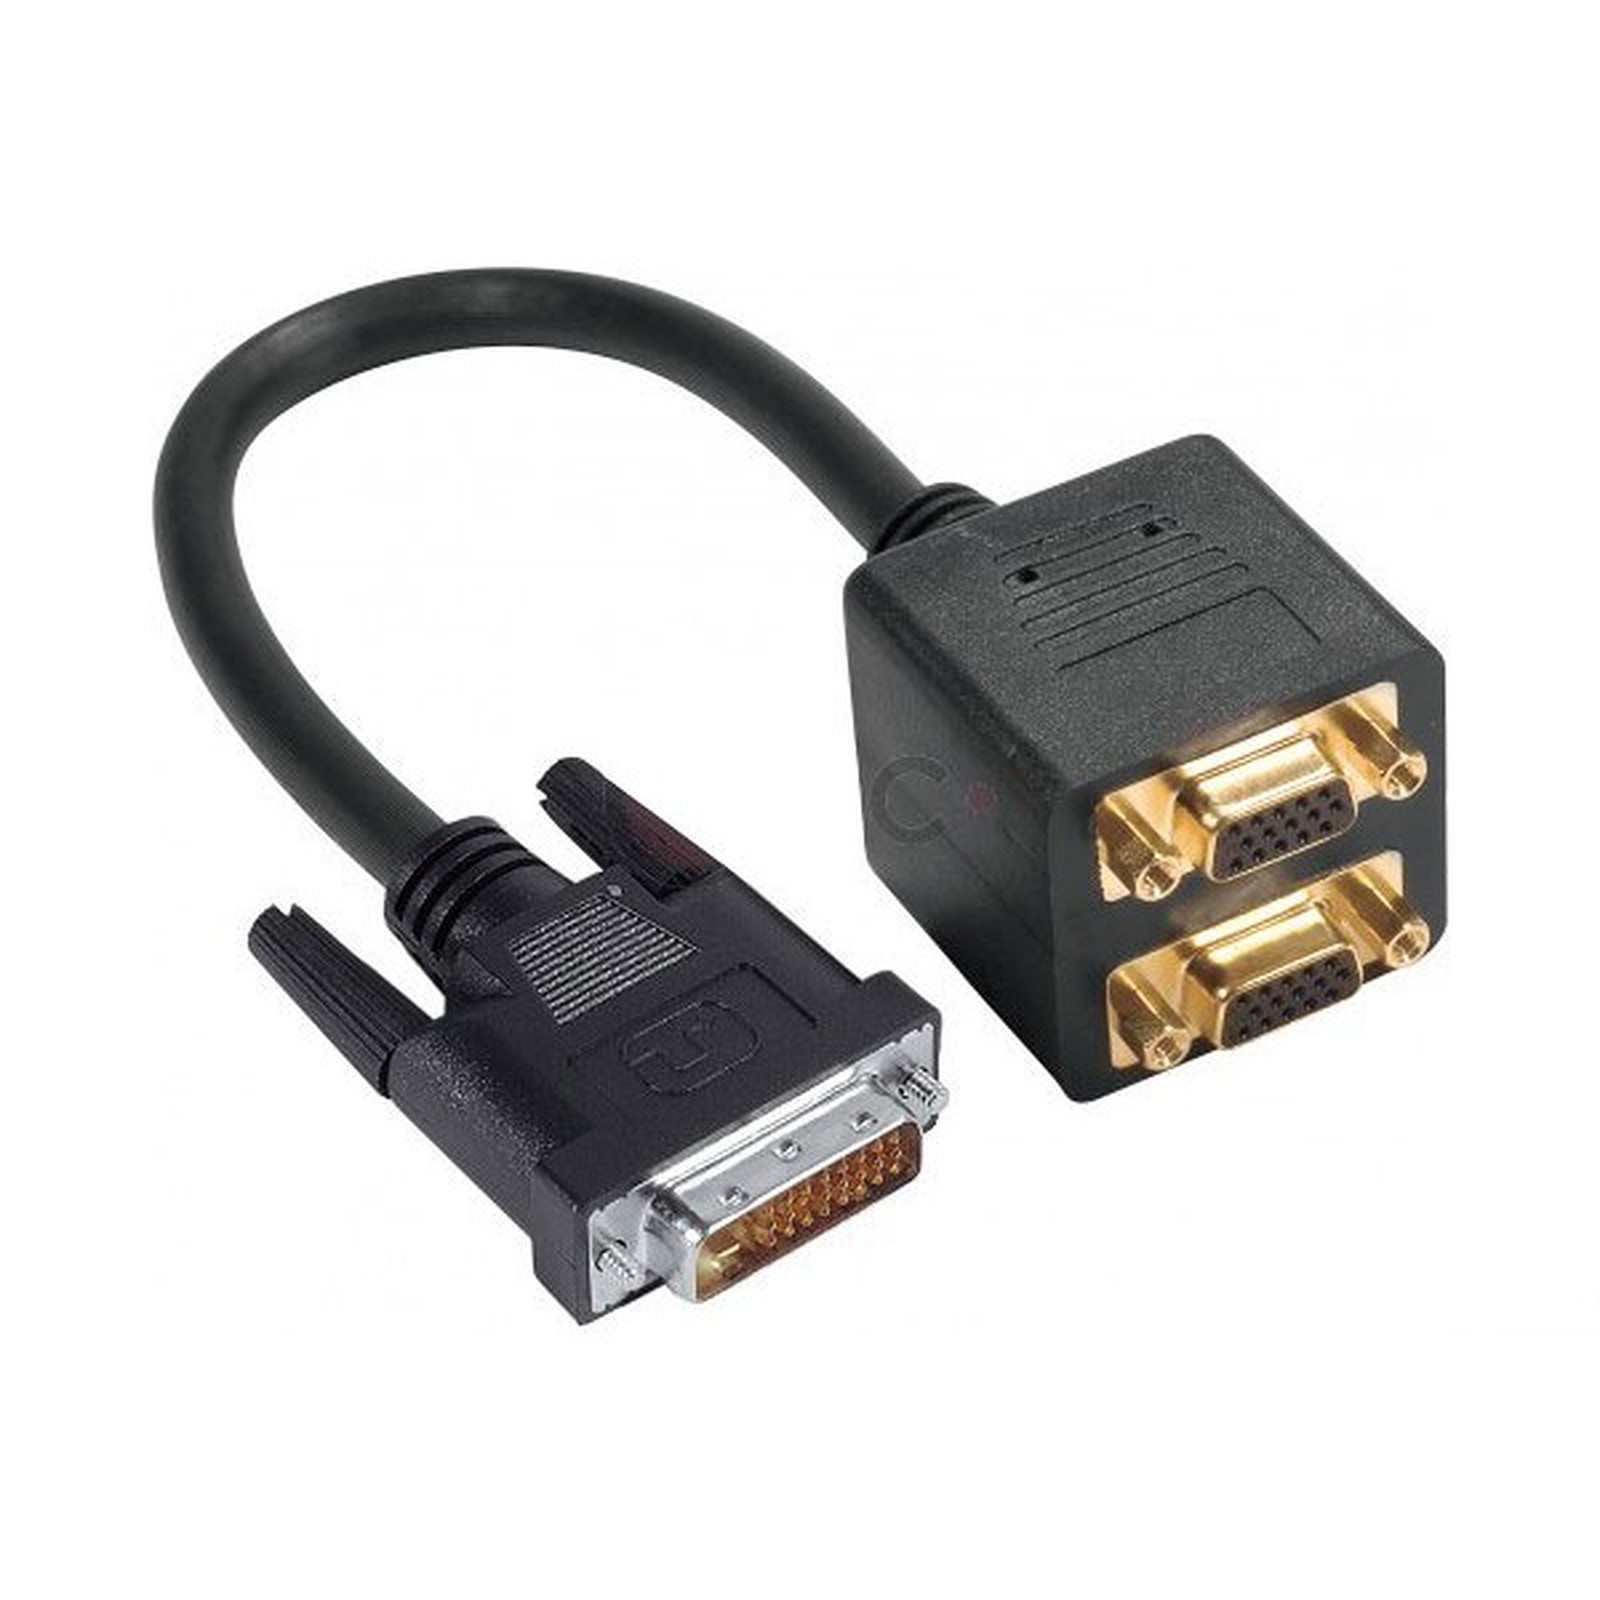 Adaptateur DVI-I Dual Link mâle / 2 VGA femelles